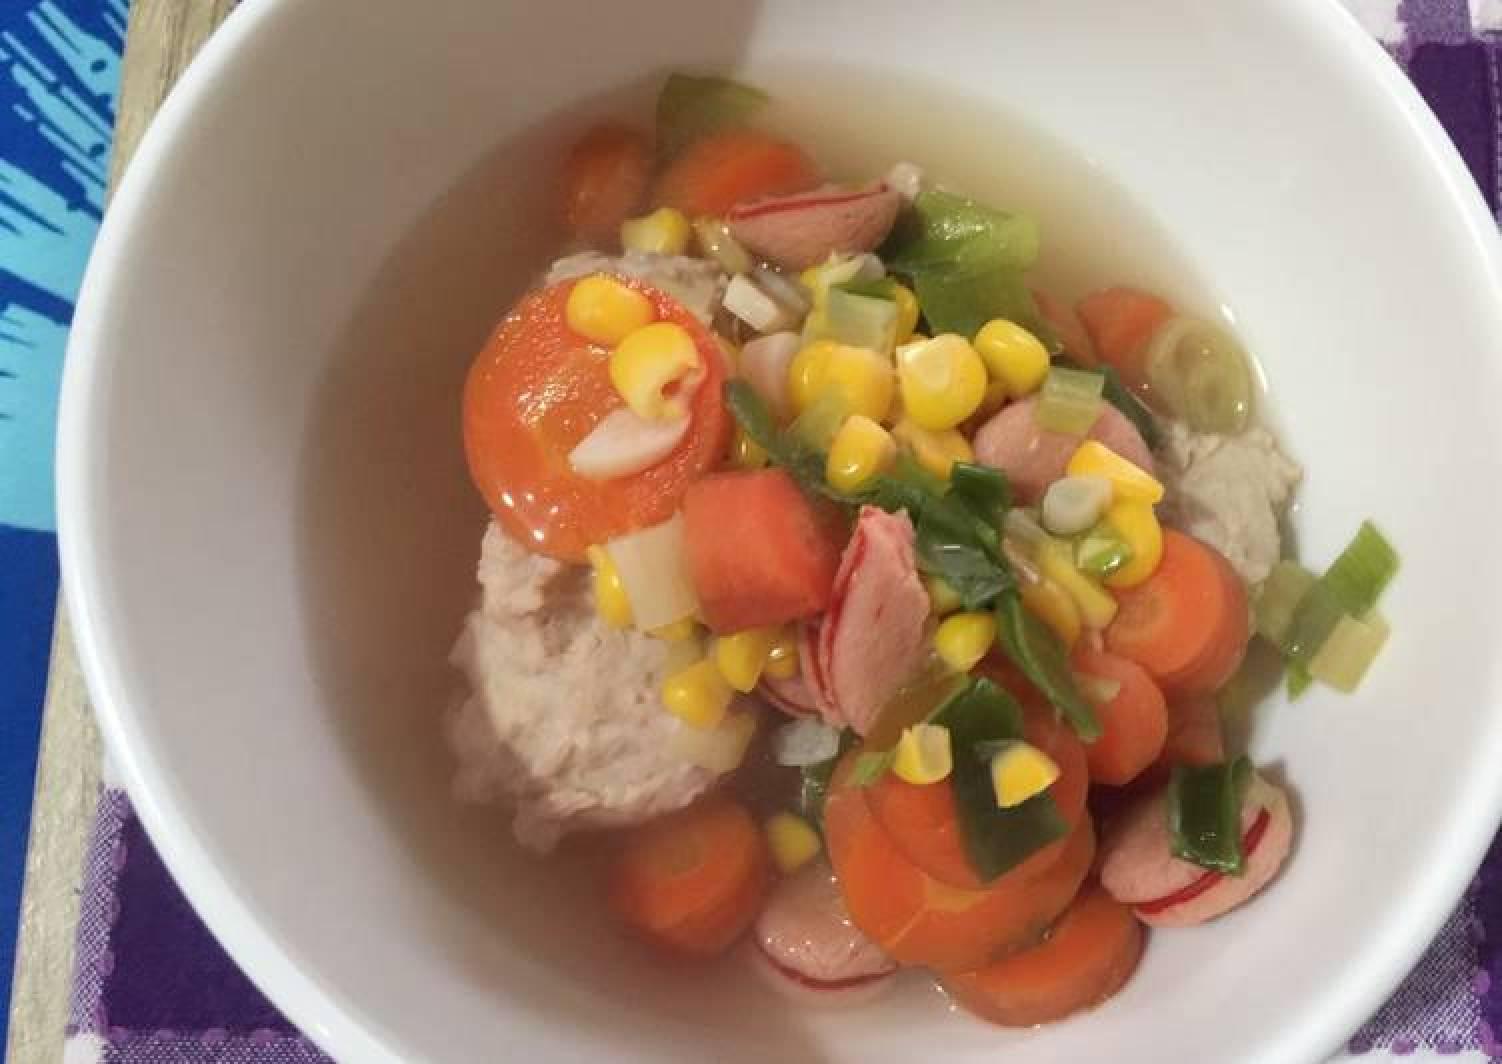 Chick medicinal soup